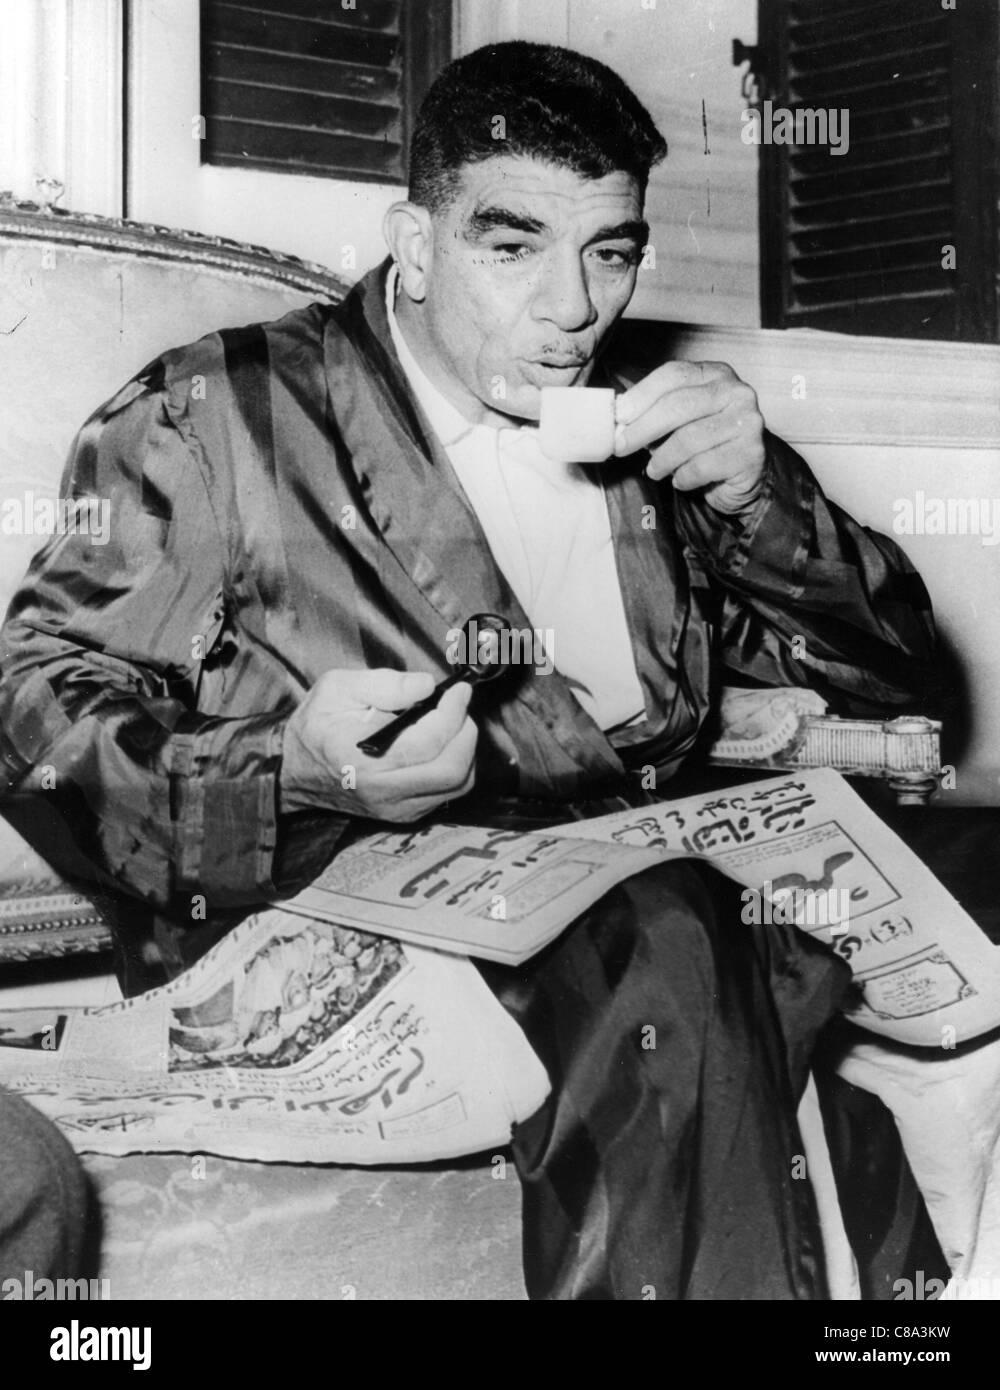 MUHAMMAD NAGUIB (1901-1984) first President of Egypt - Stock Image